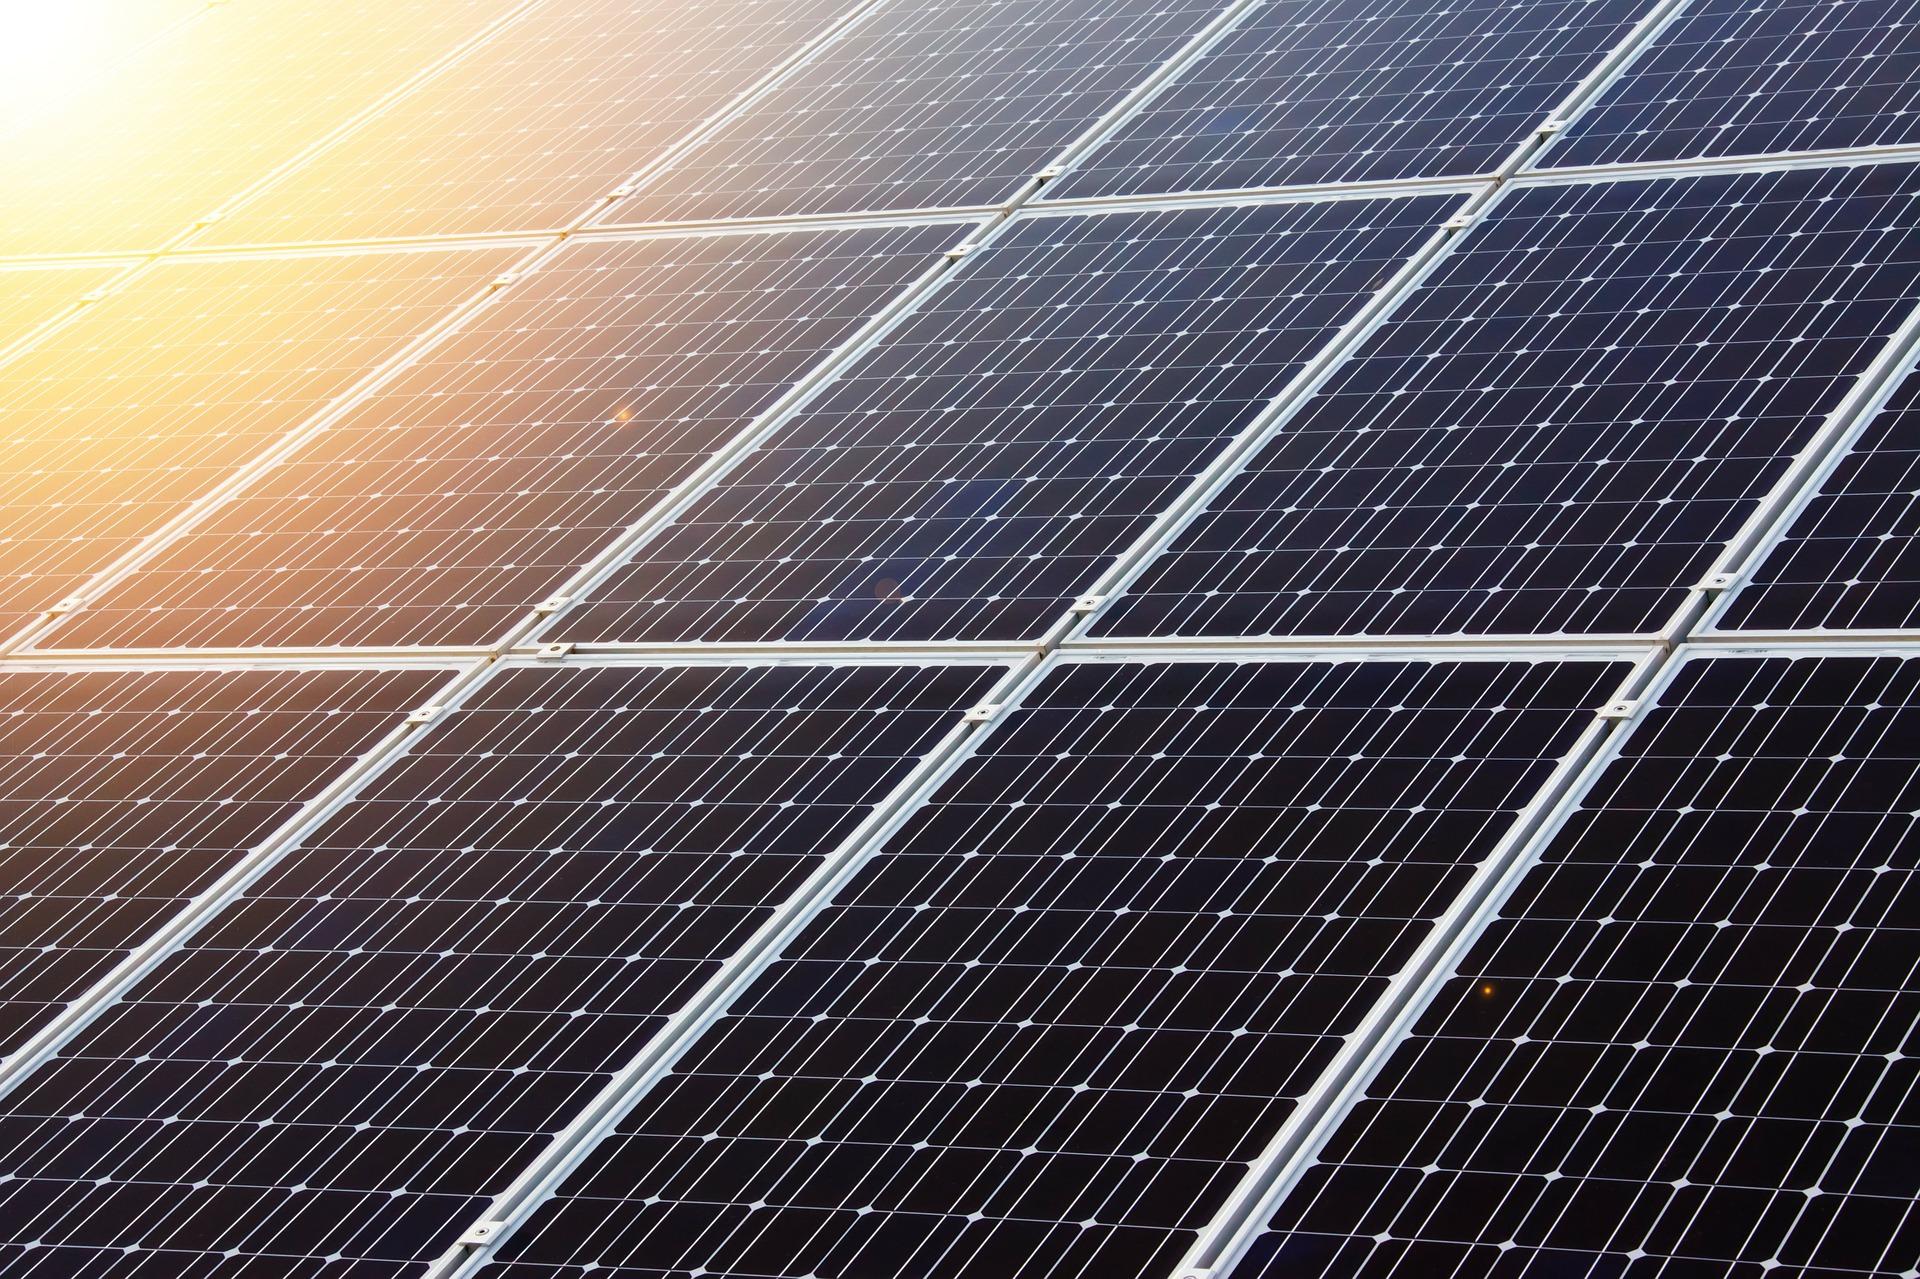 Fotovoltaico - soetech.it